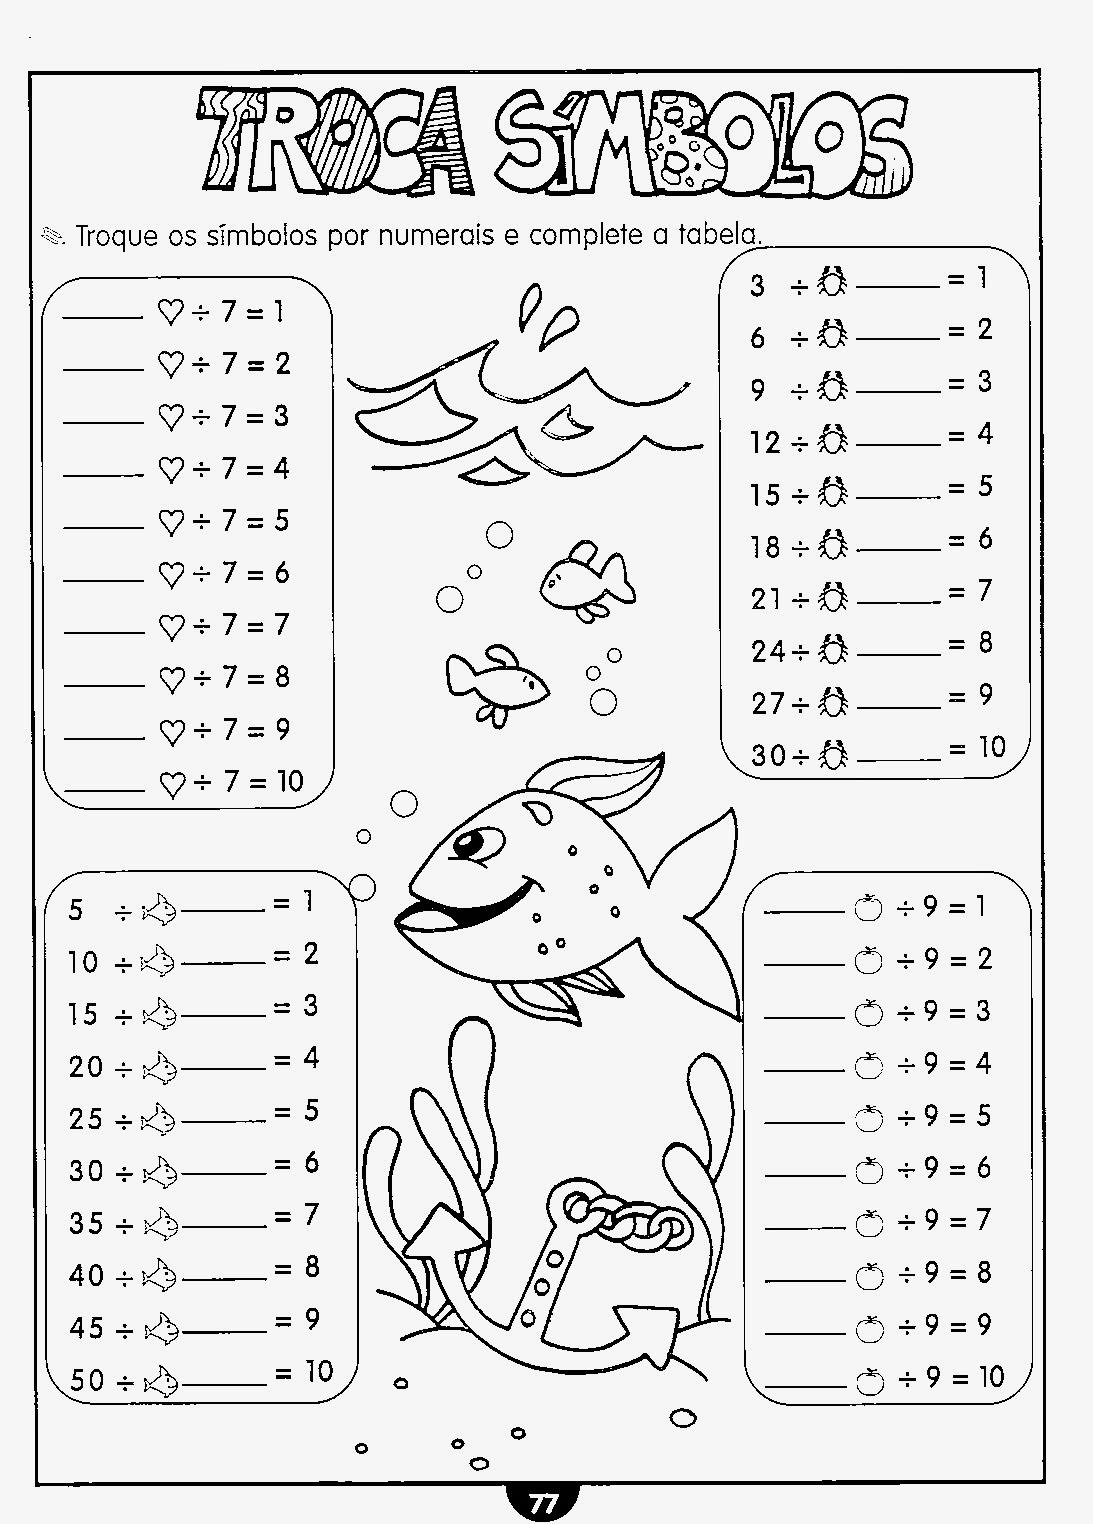 Atividades educativas de matemática 2 ano